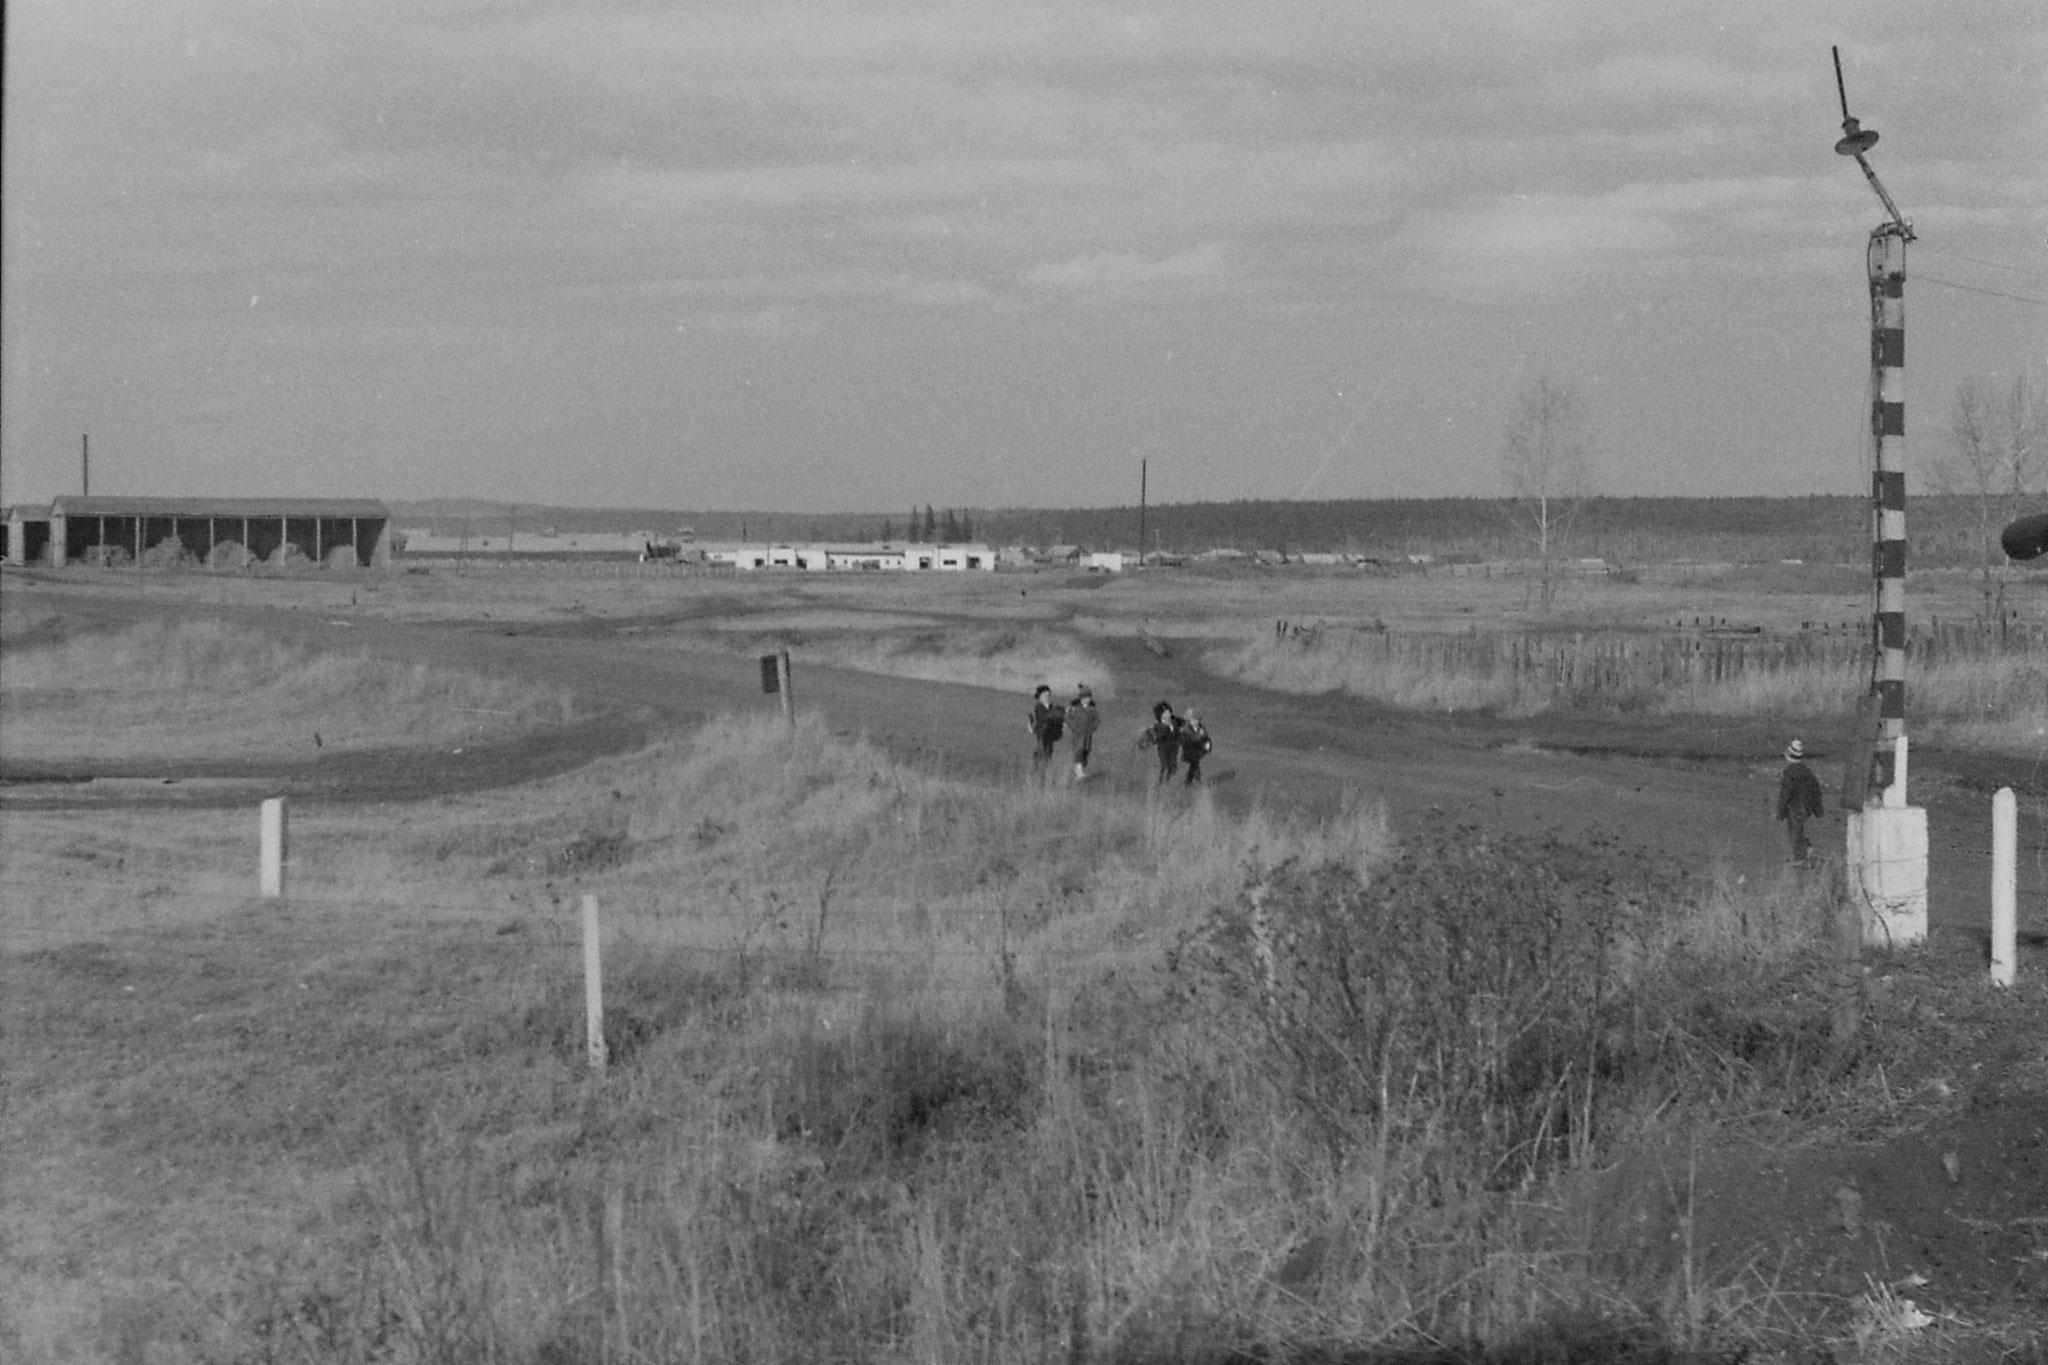 21/10/1988: 13: children at level crossing